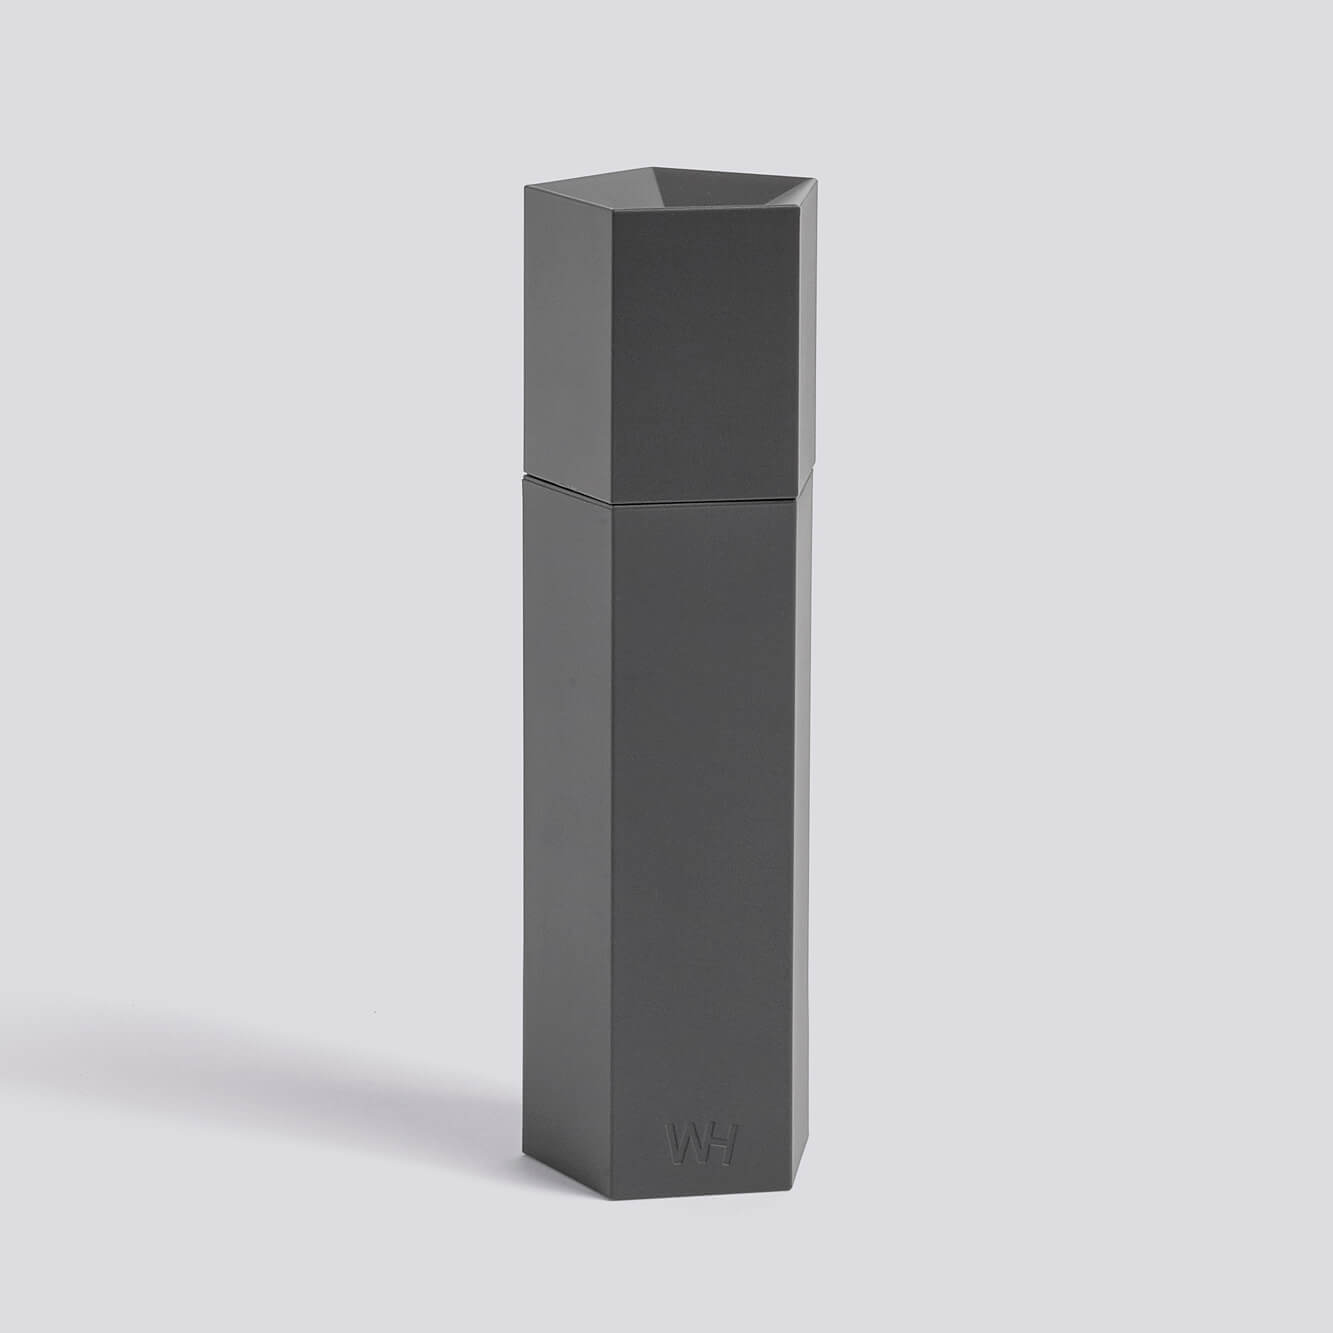 hay ori salz pfefferm hle light grey h he 18 cm durchmesser 5 cm. Black Bedroom Furniture Sets. Home Design Ideas